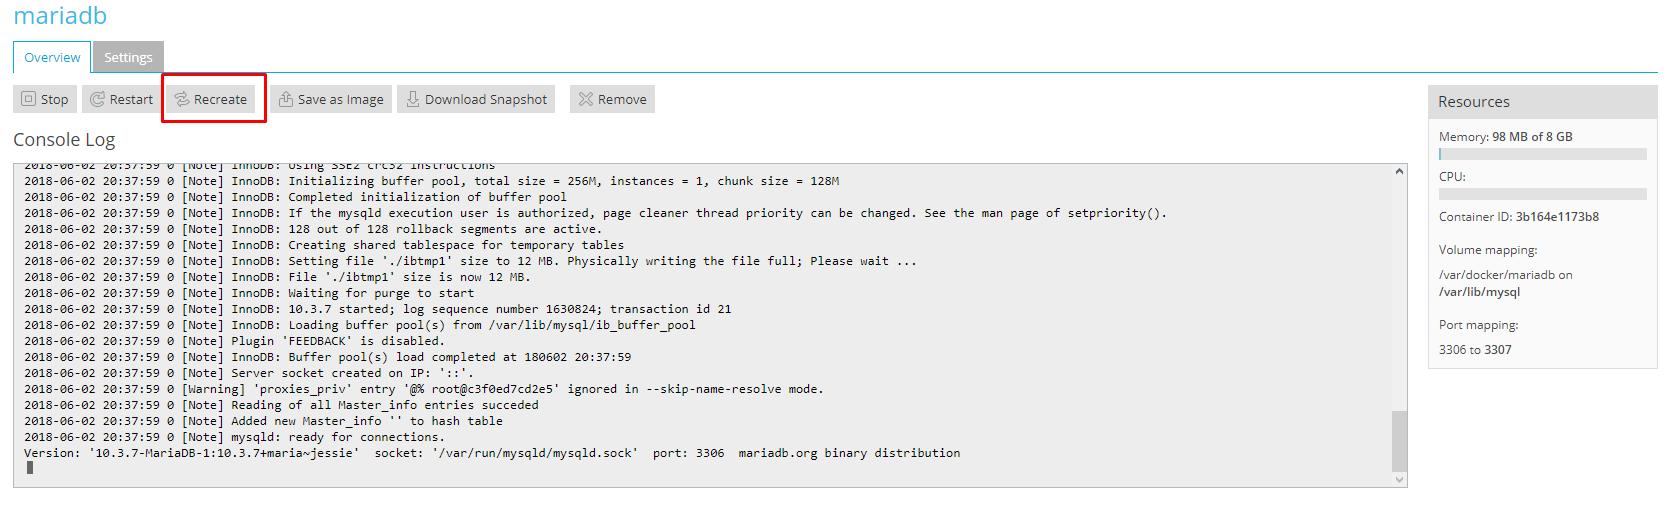 How to run MariaDB 20.20 on Plesk Onyx with Docker   VirtuBox